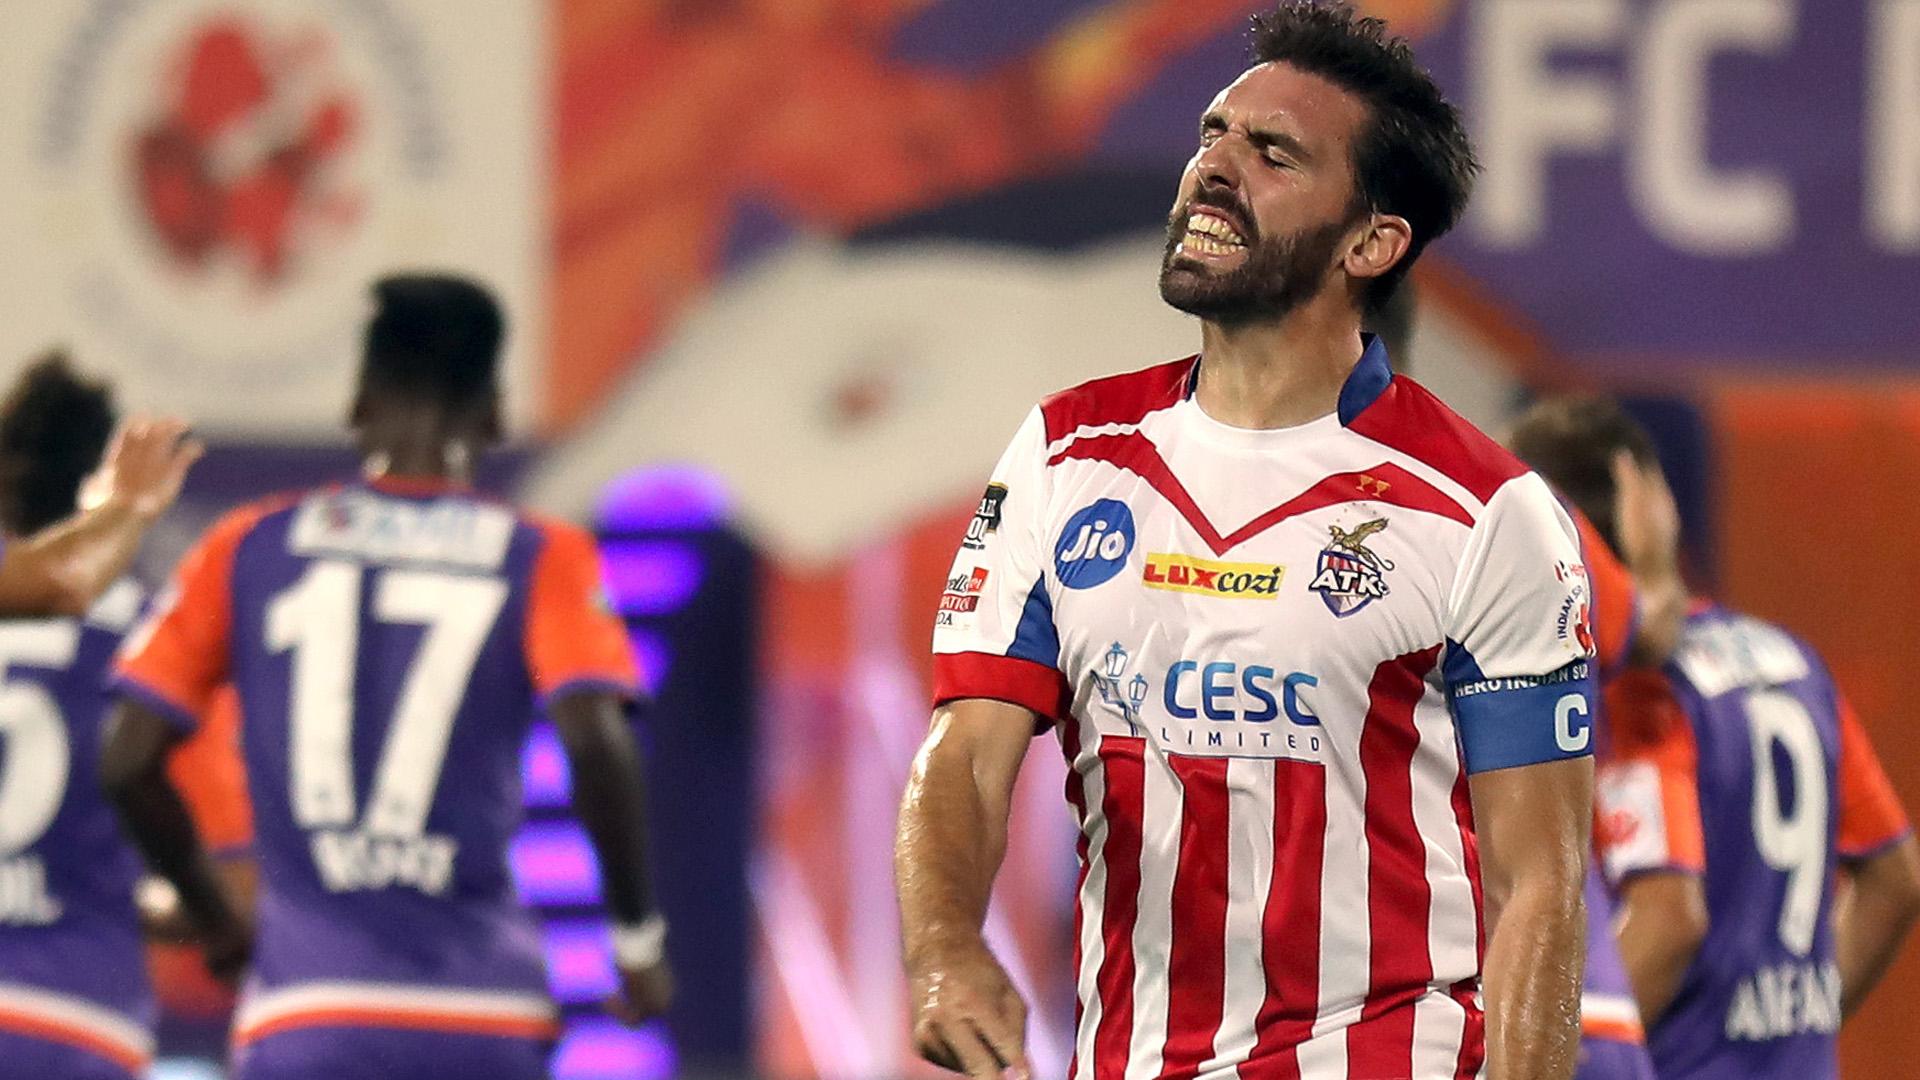 Jordi Figueras FC Pune City ATK ISL 4 2017/2018